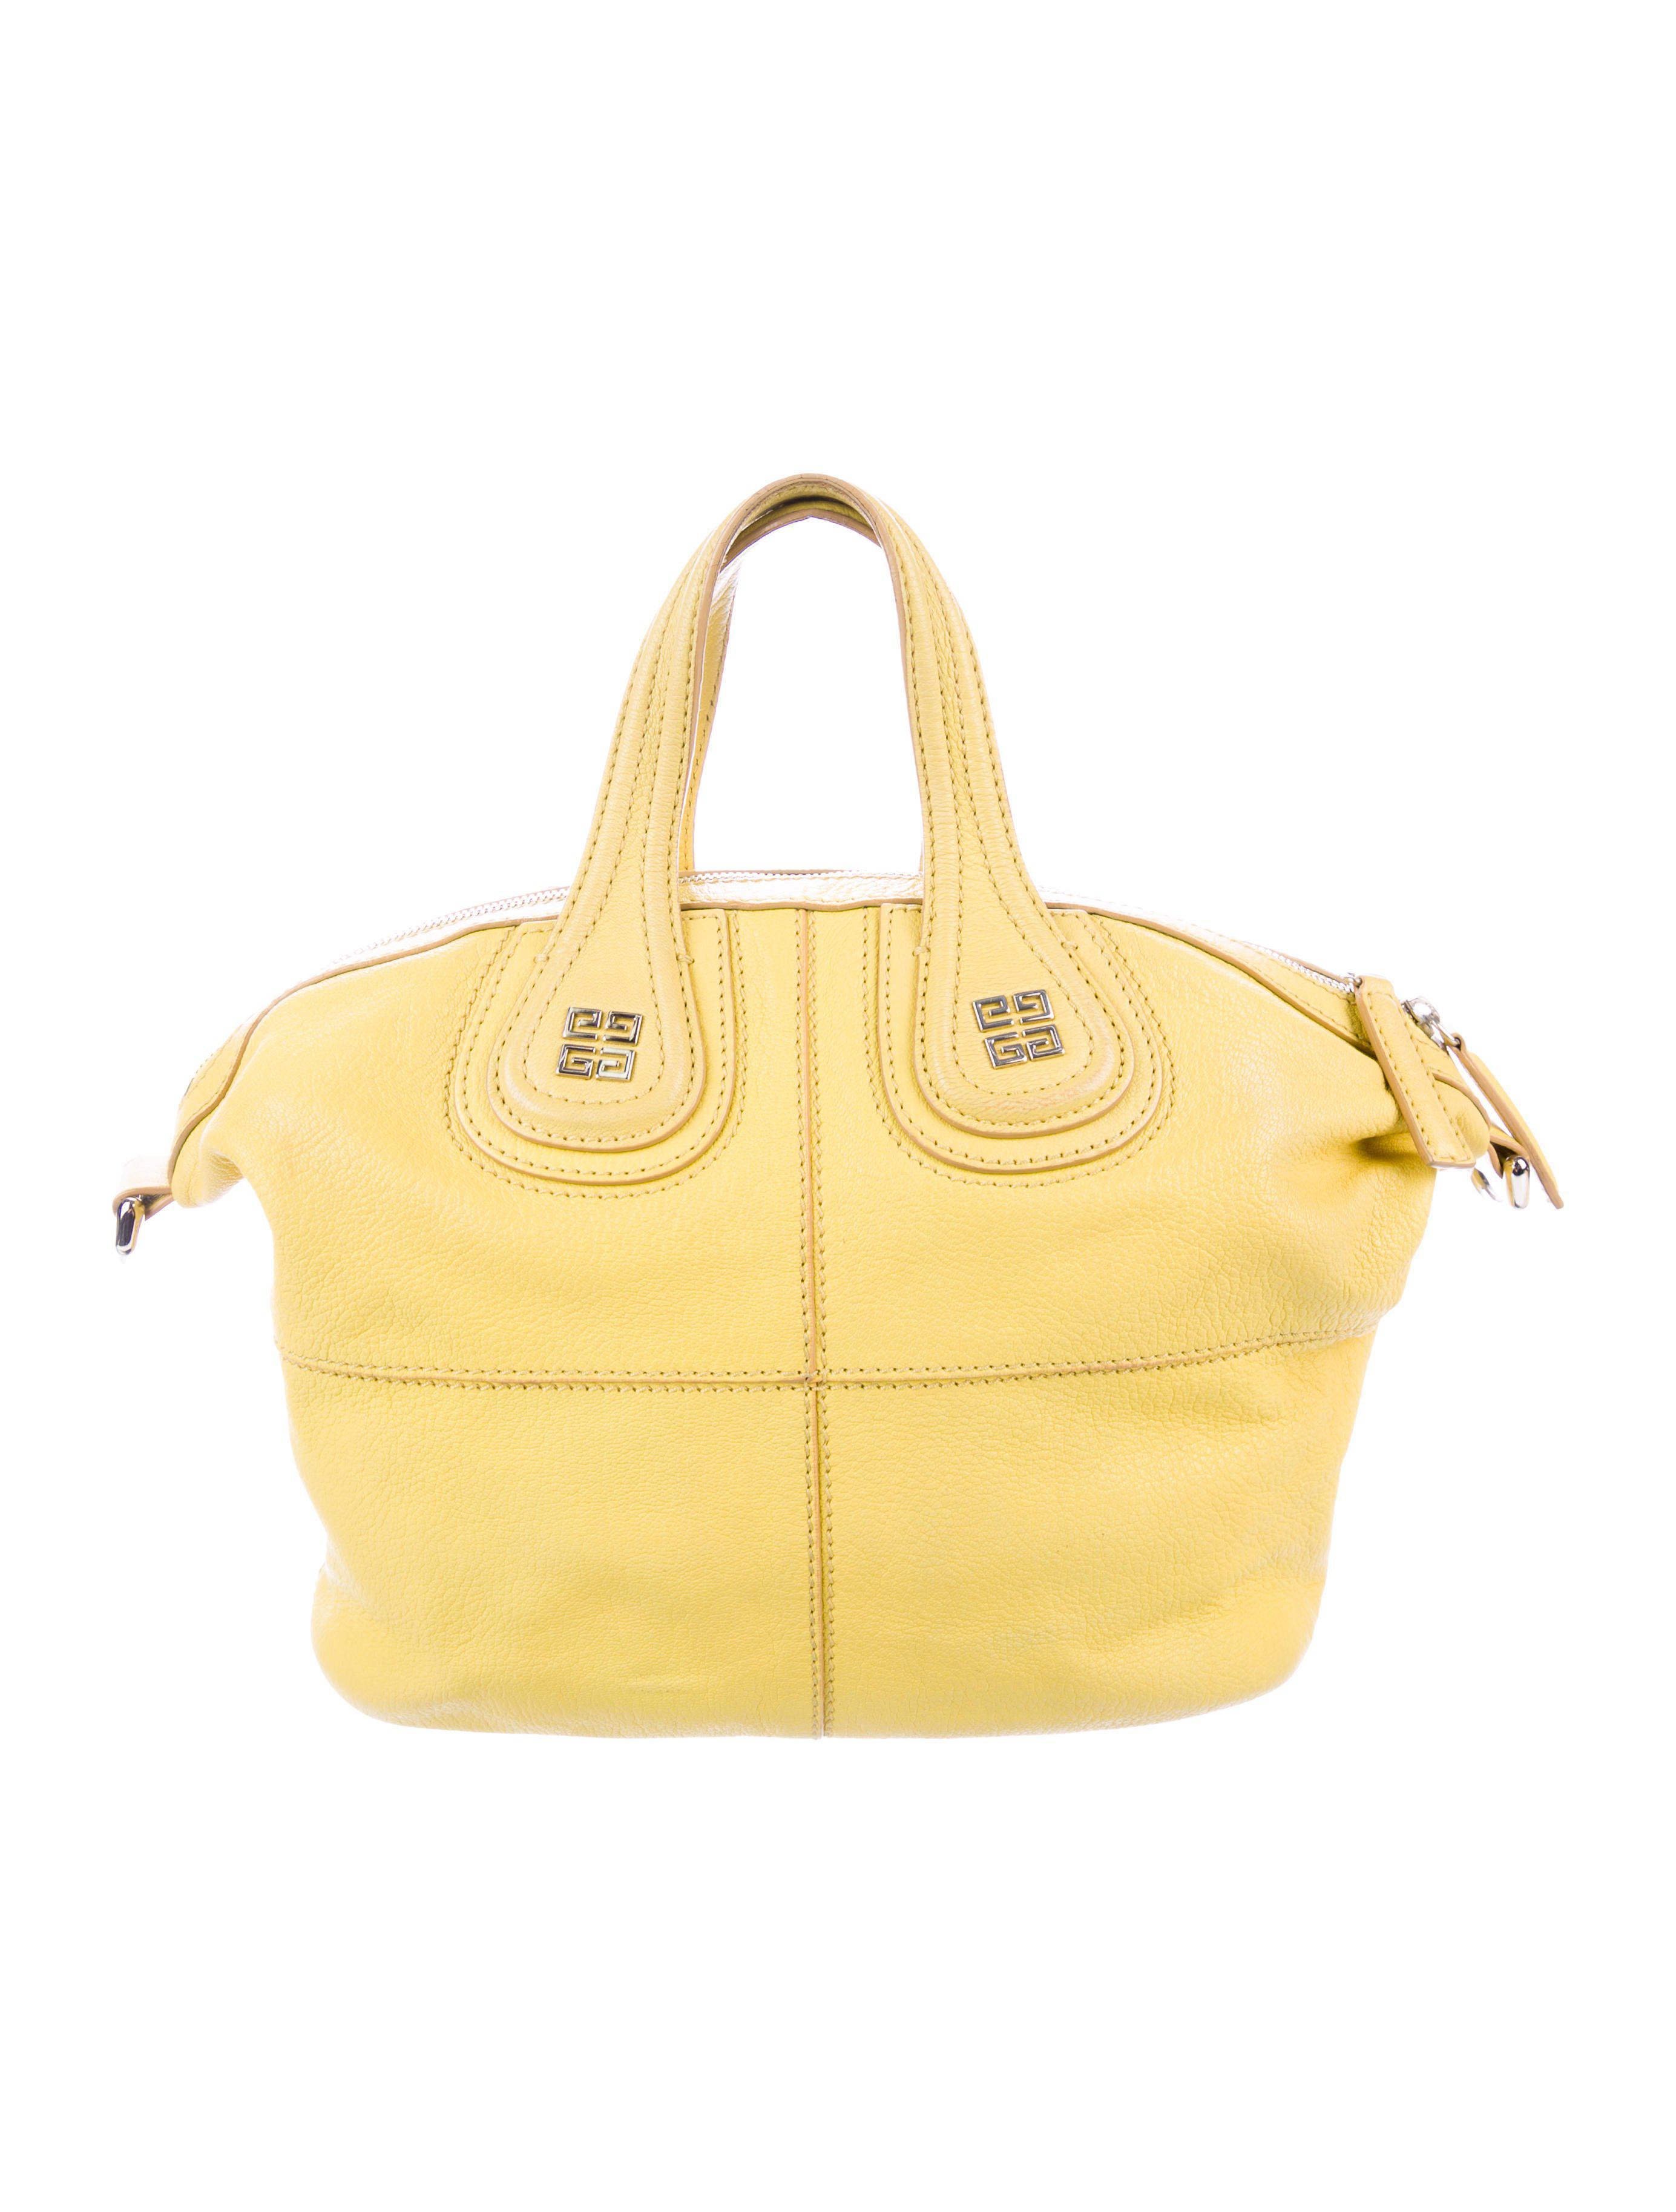 a2ccb6328f7f Lyst - Givenchy Medium Nightingale Satchel Yellow in Metallic